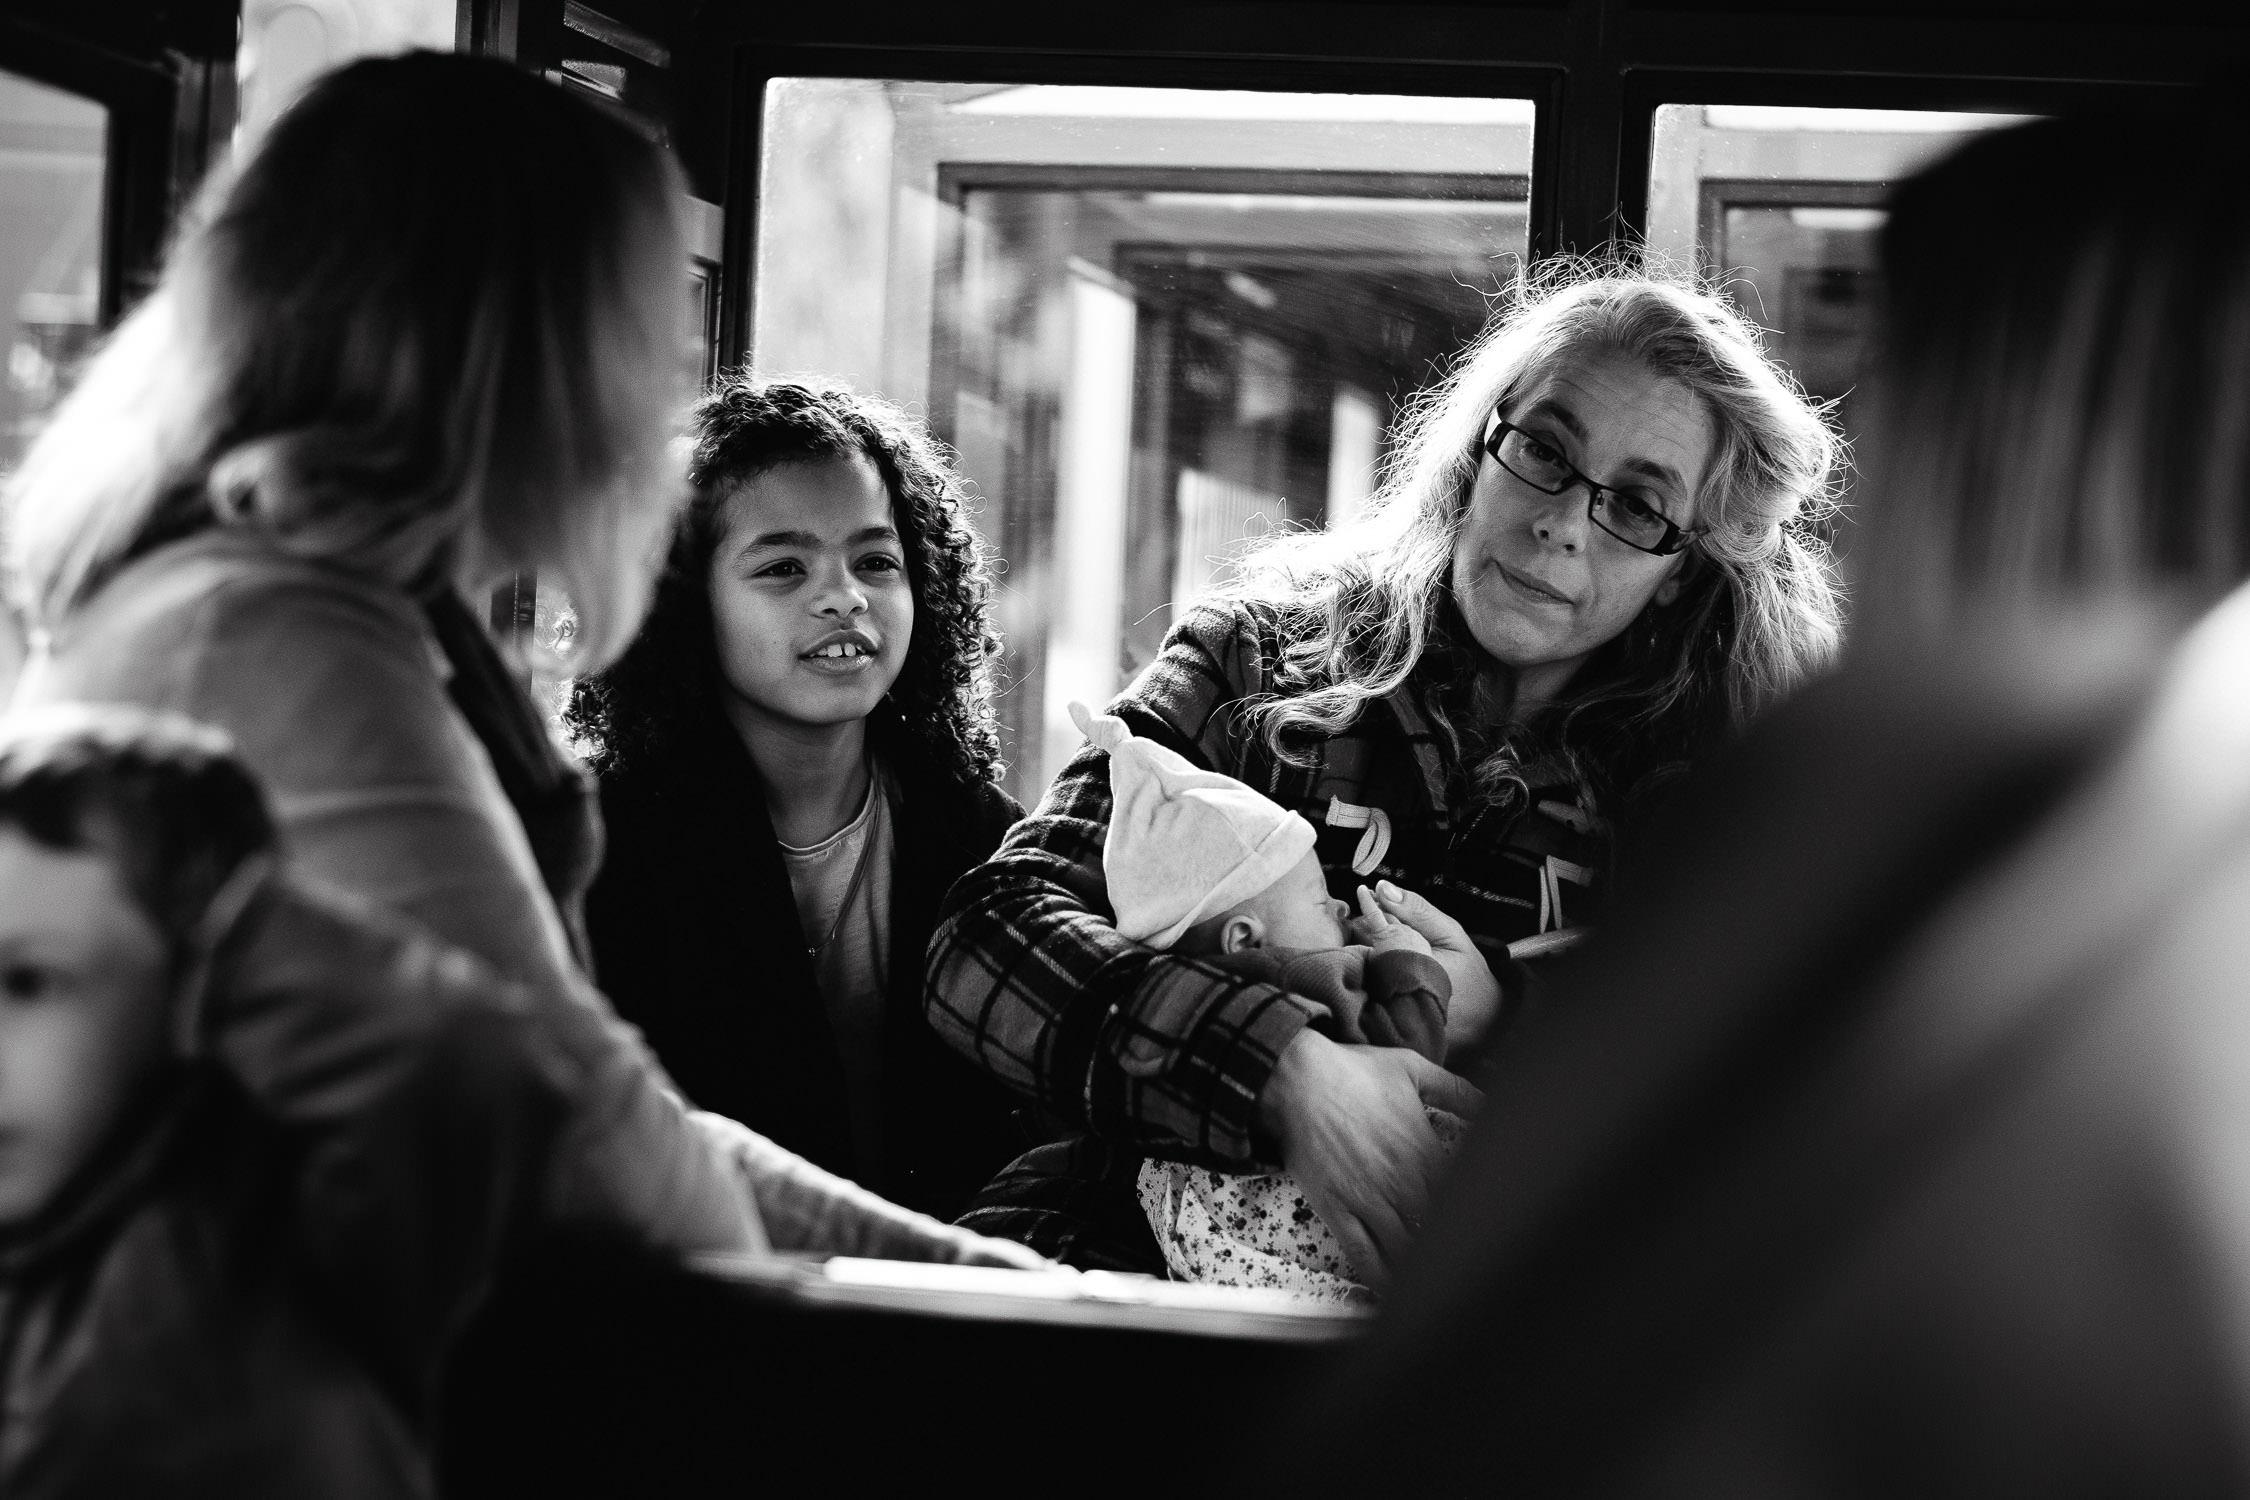 little girl sitting on train